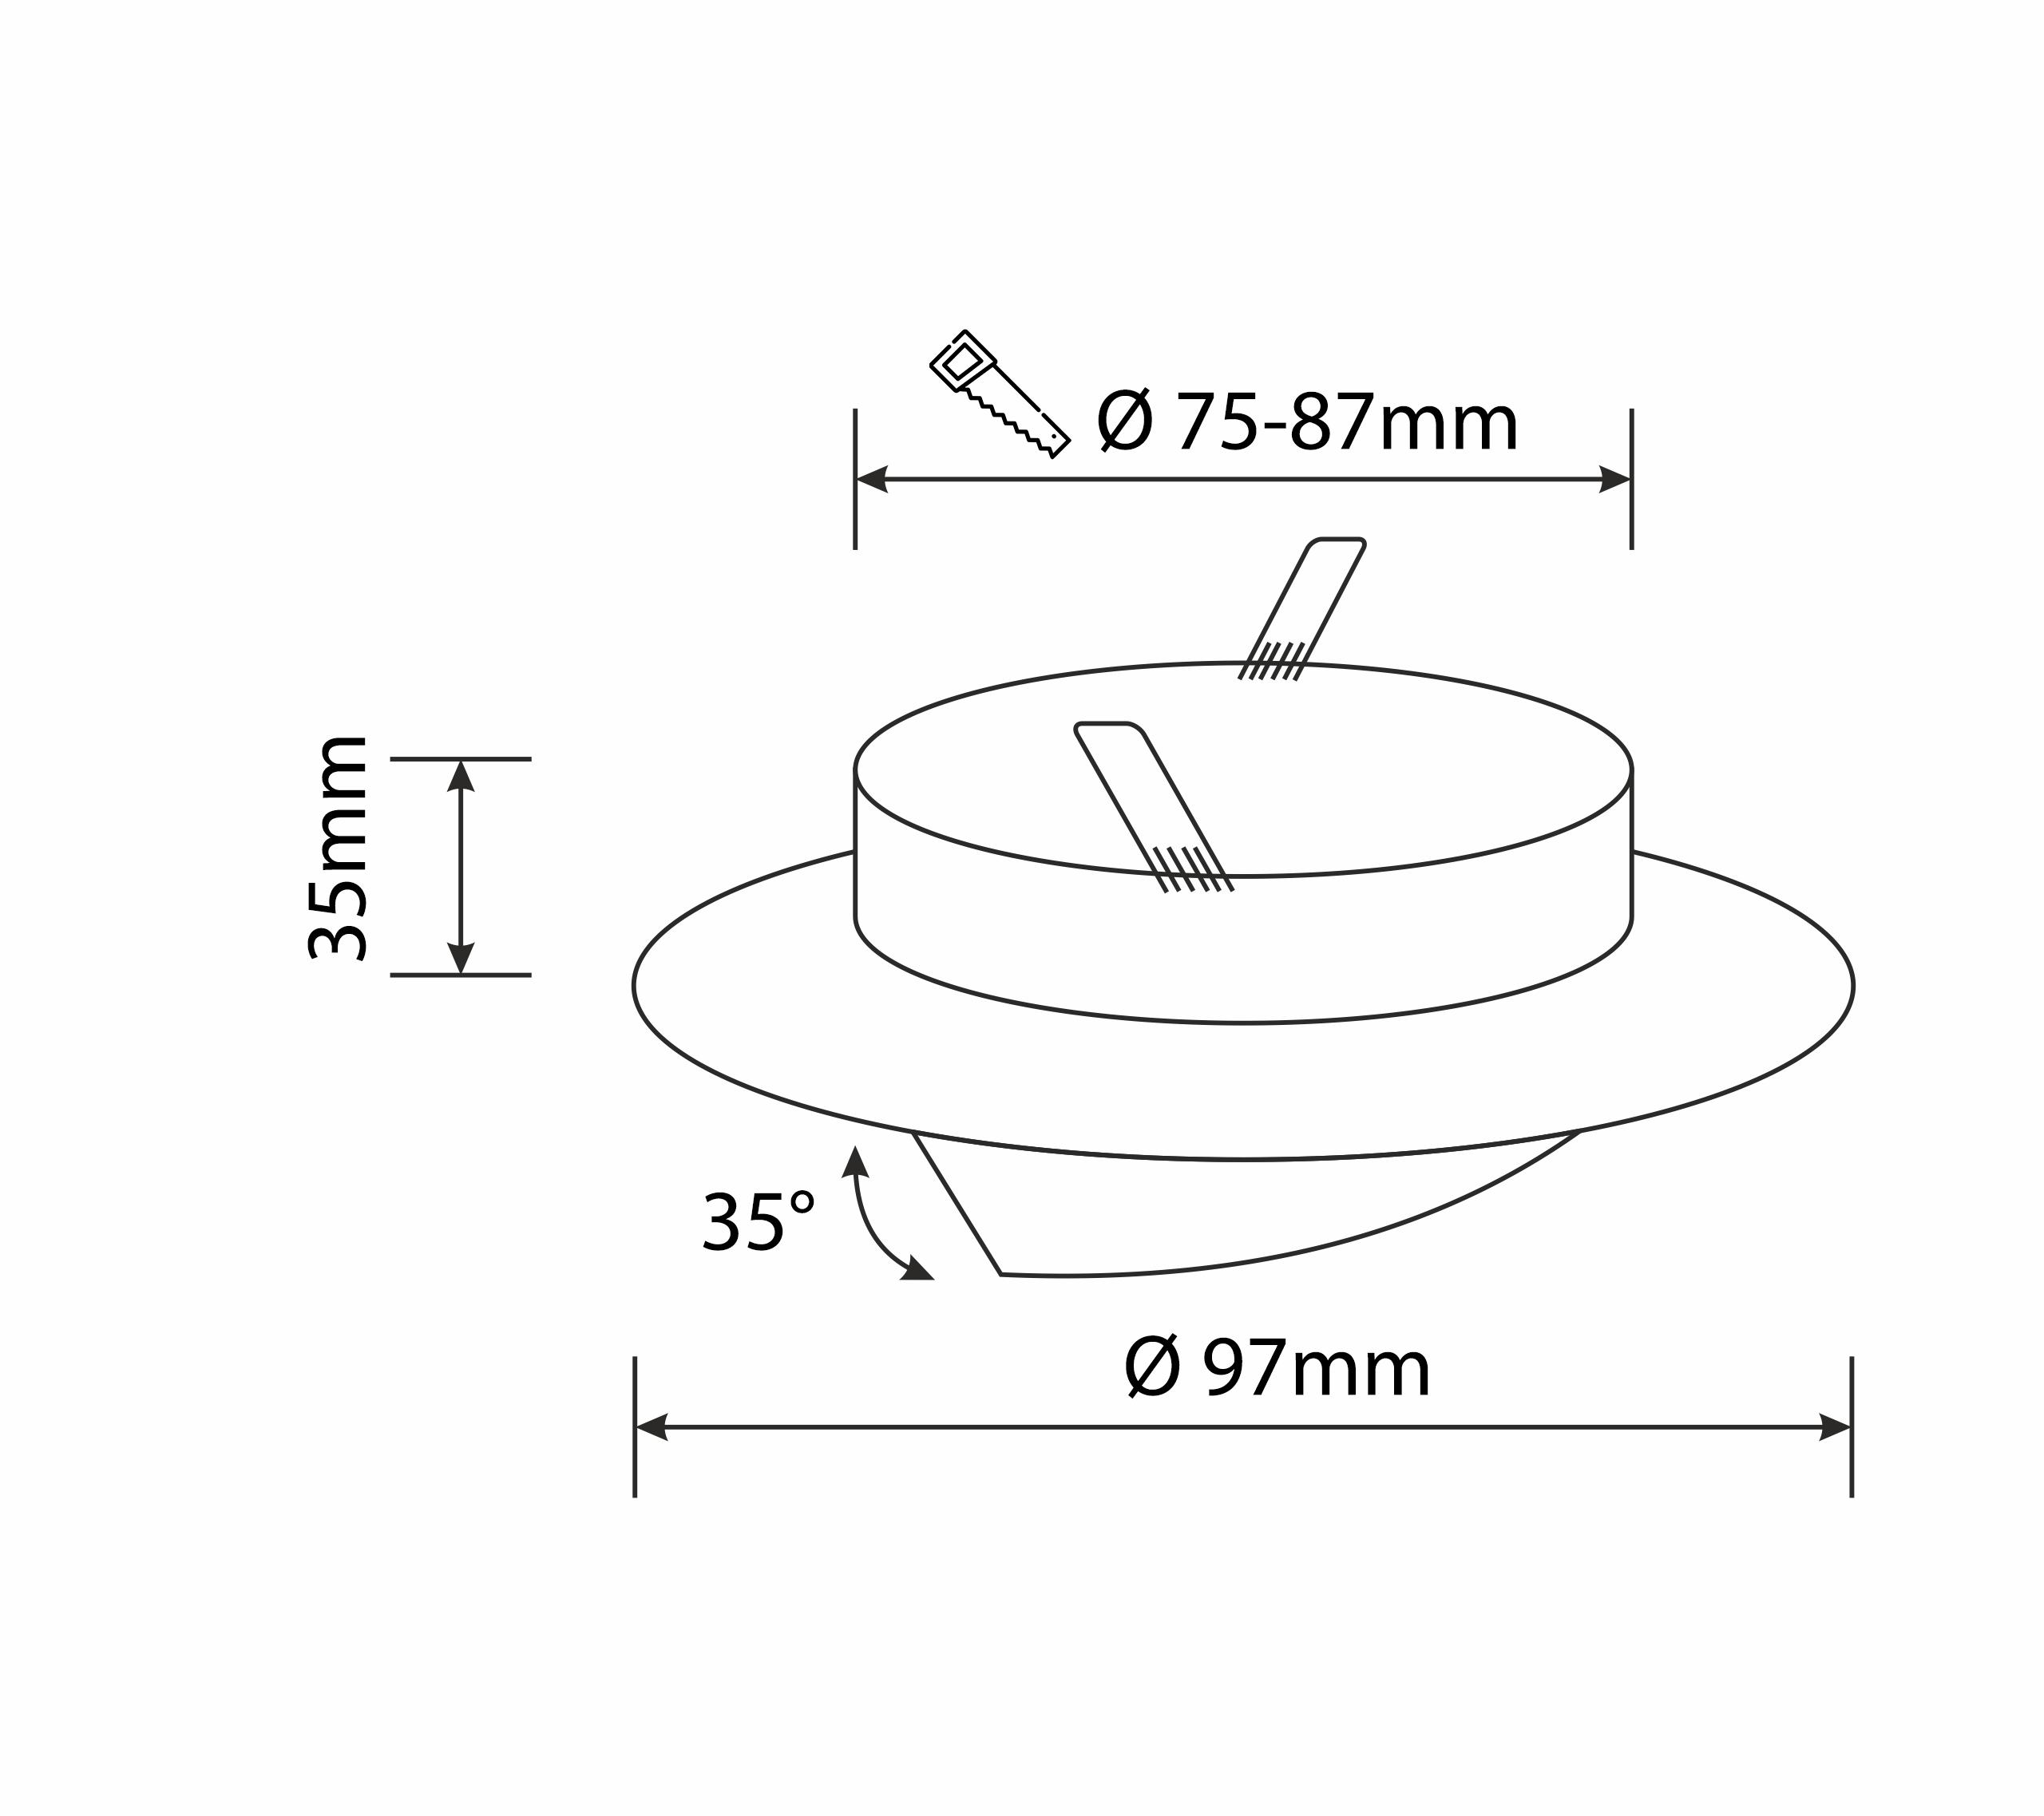 6x LED Einbaustrahler Set 5-7 Watt schwenkbar rund MR16 12V Einbauspot 65mm